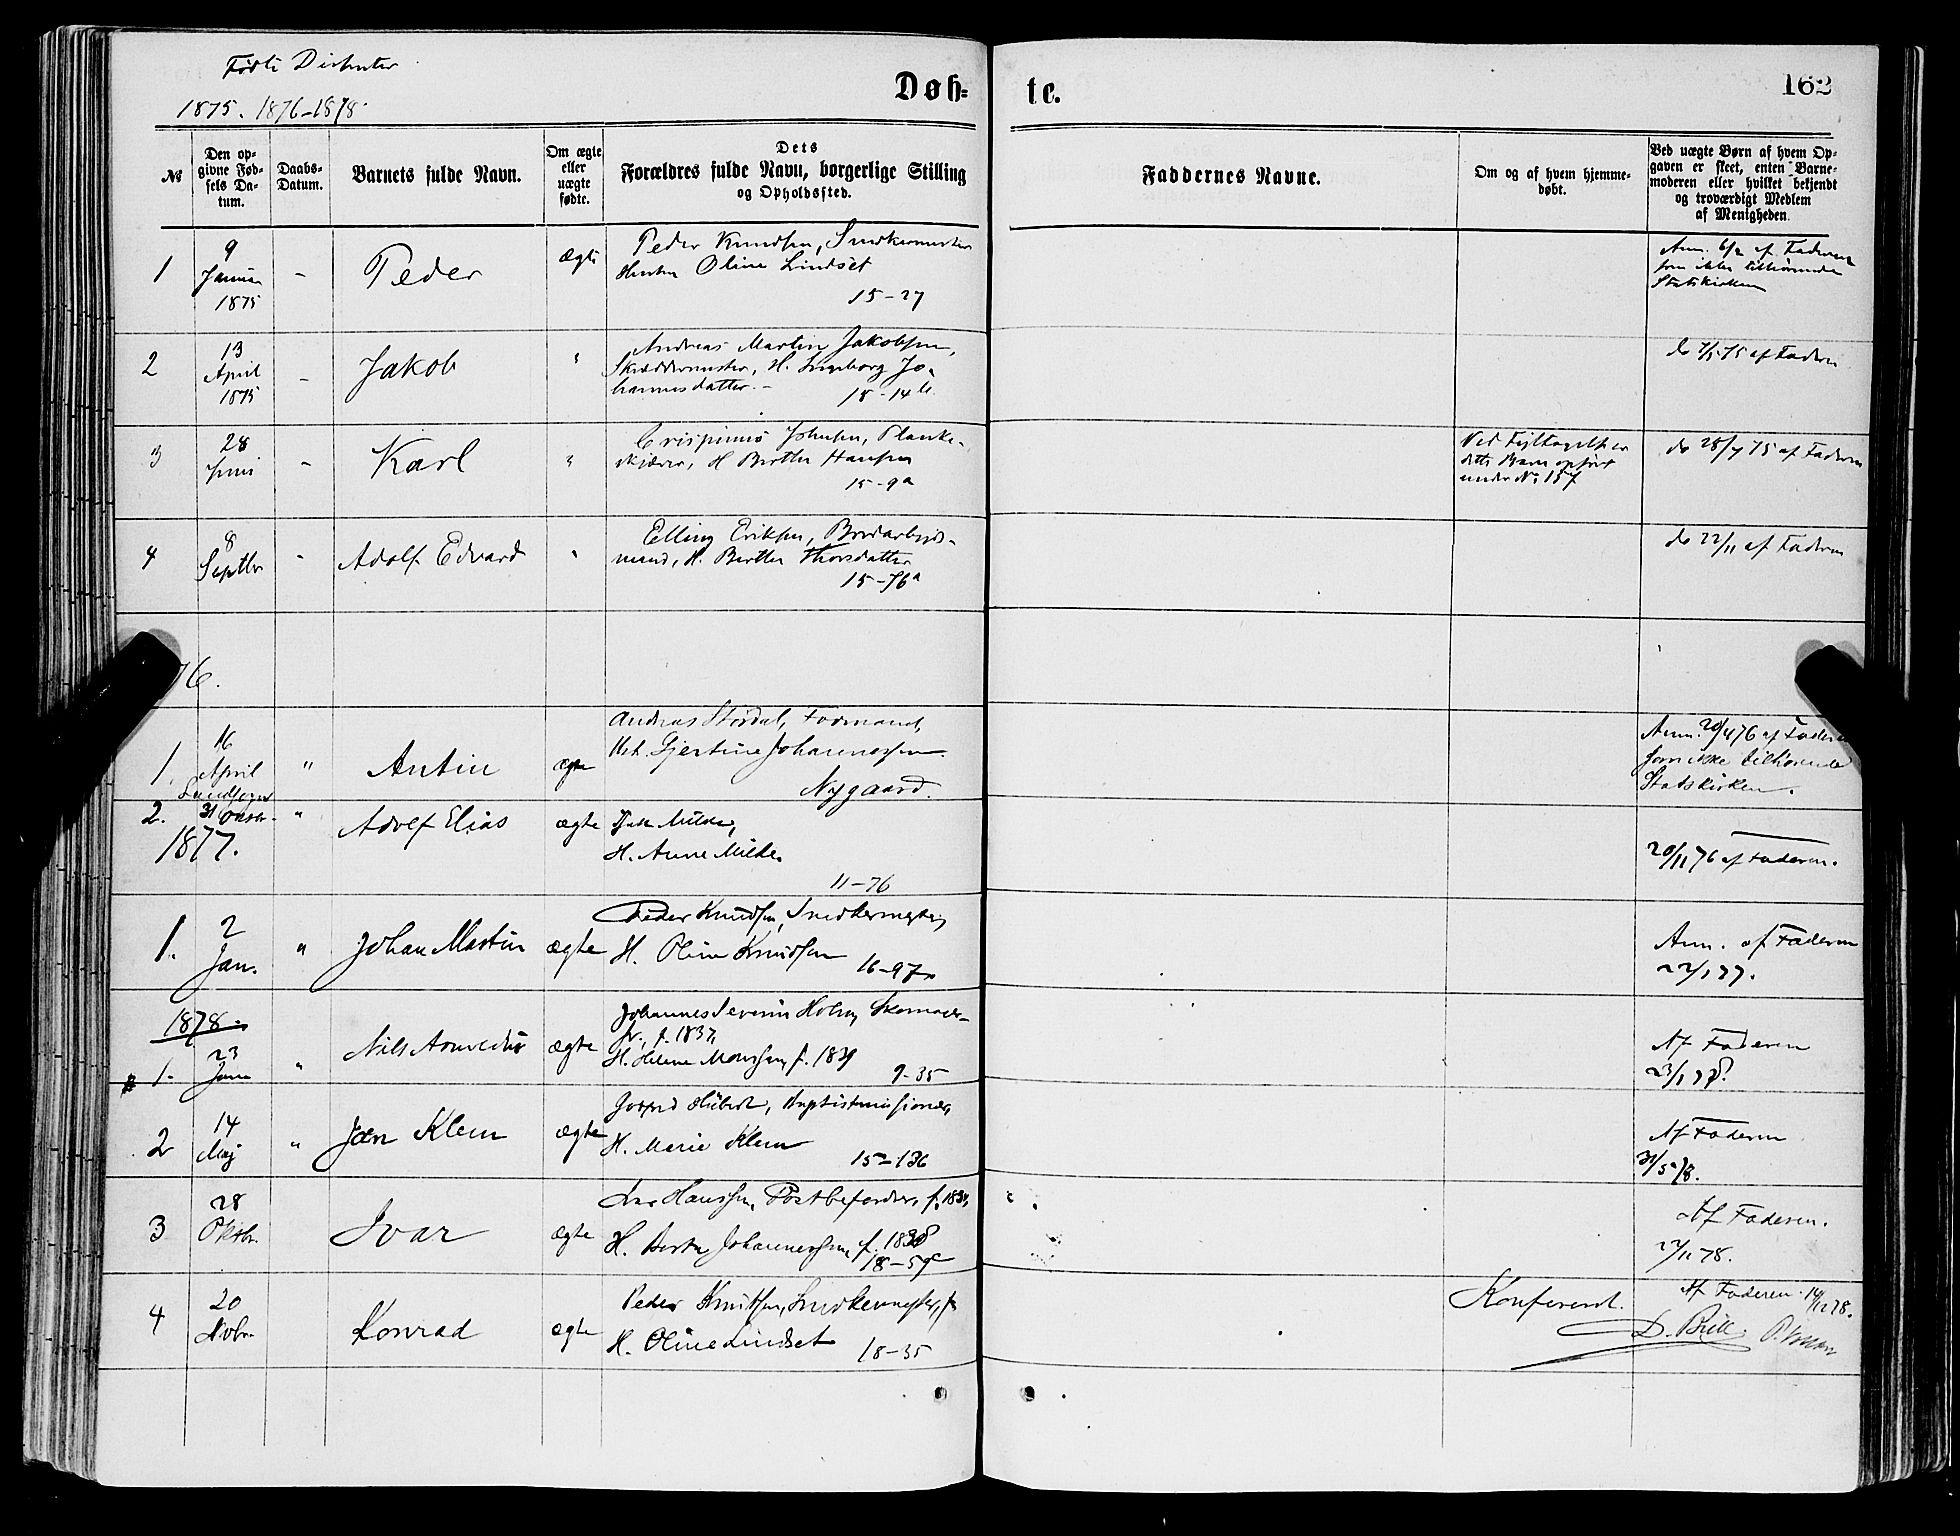 SAB, Domkirken sokneprestembete, H/Haa/L0022: Ministerialbok nr. B 5, 1872-1878, s. 162